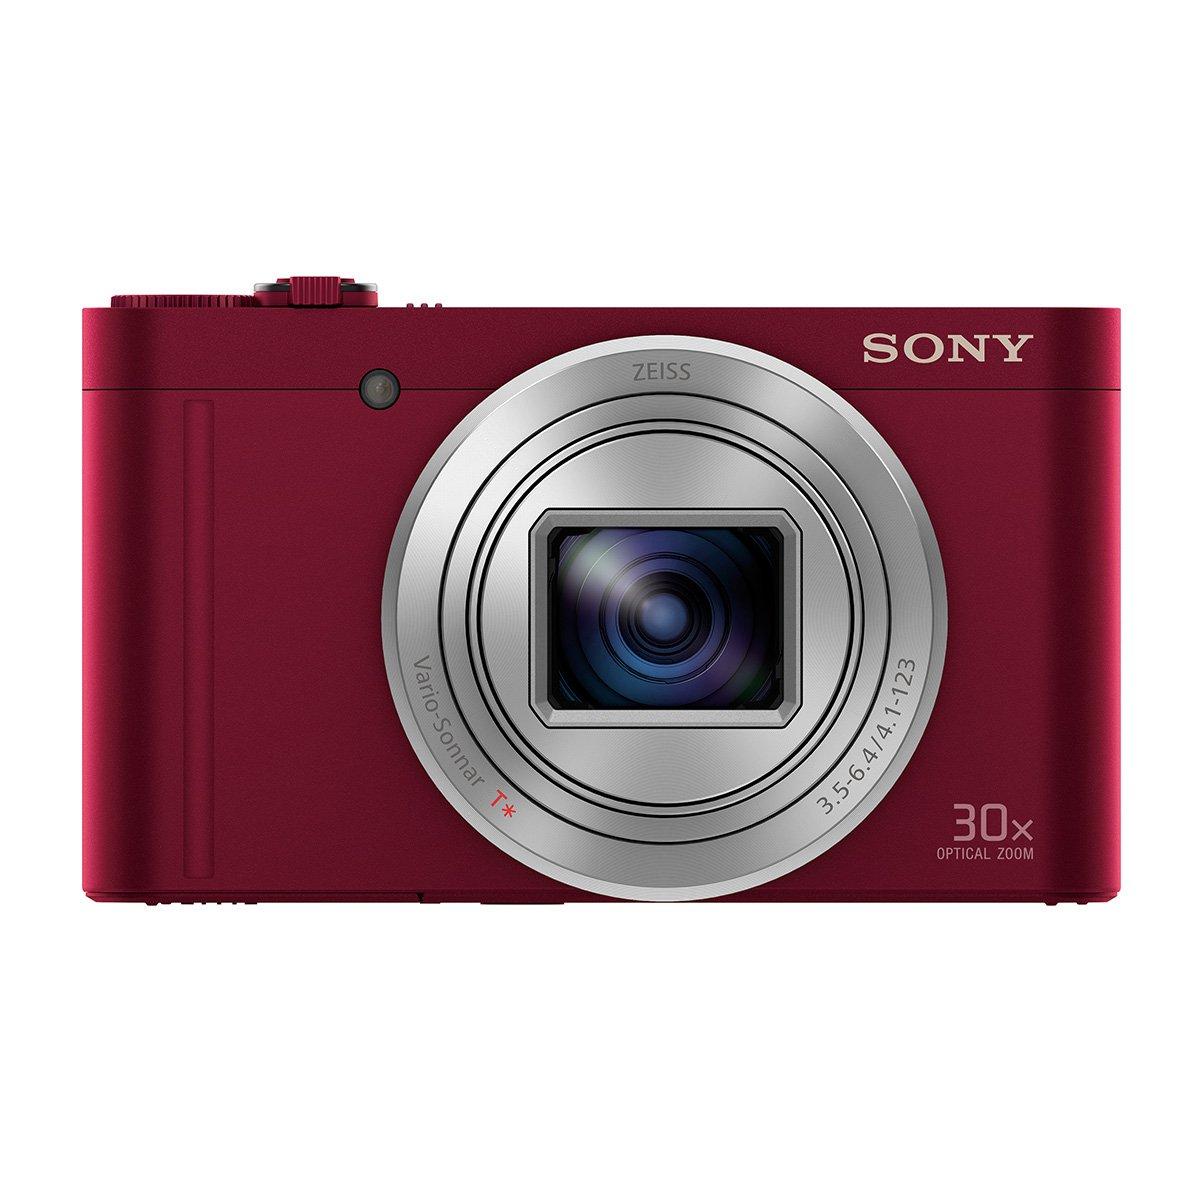 Sony Cybershot DSC-WX500/R 18.2MP Digital Camera (Red)